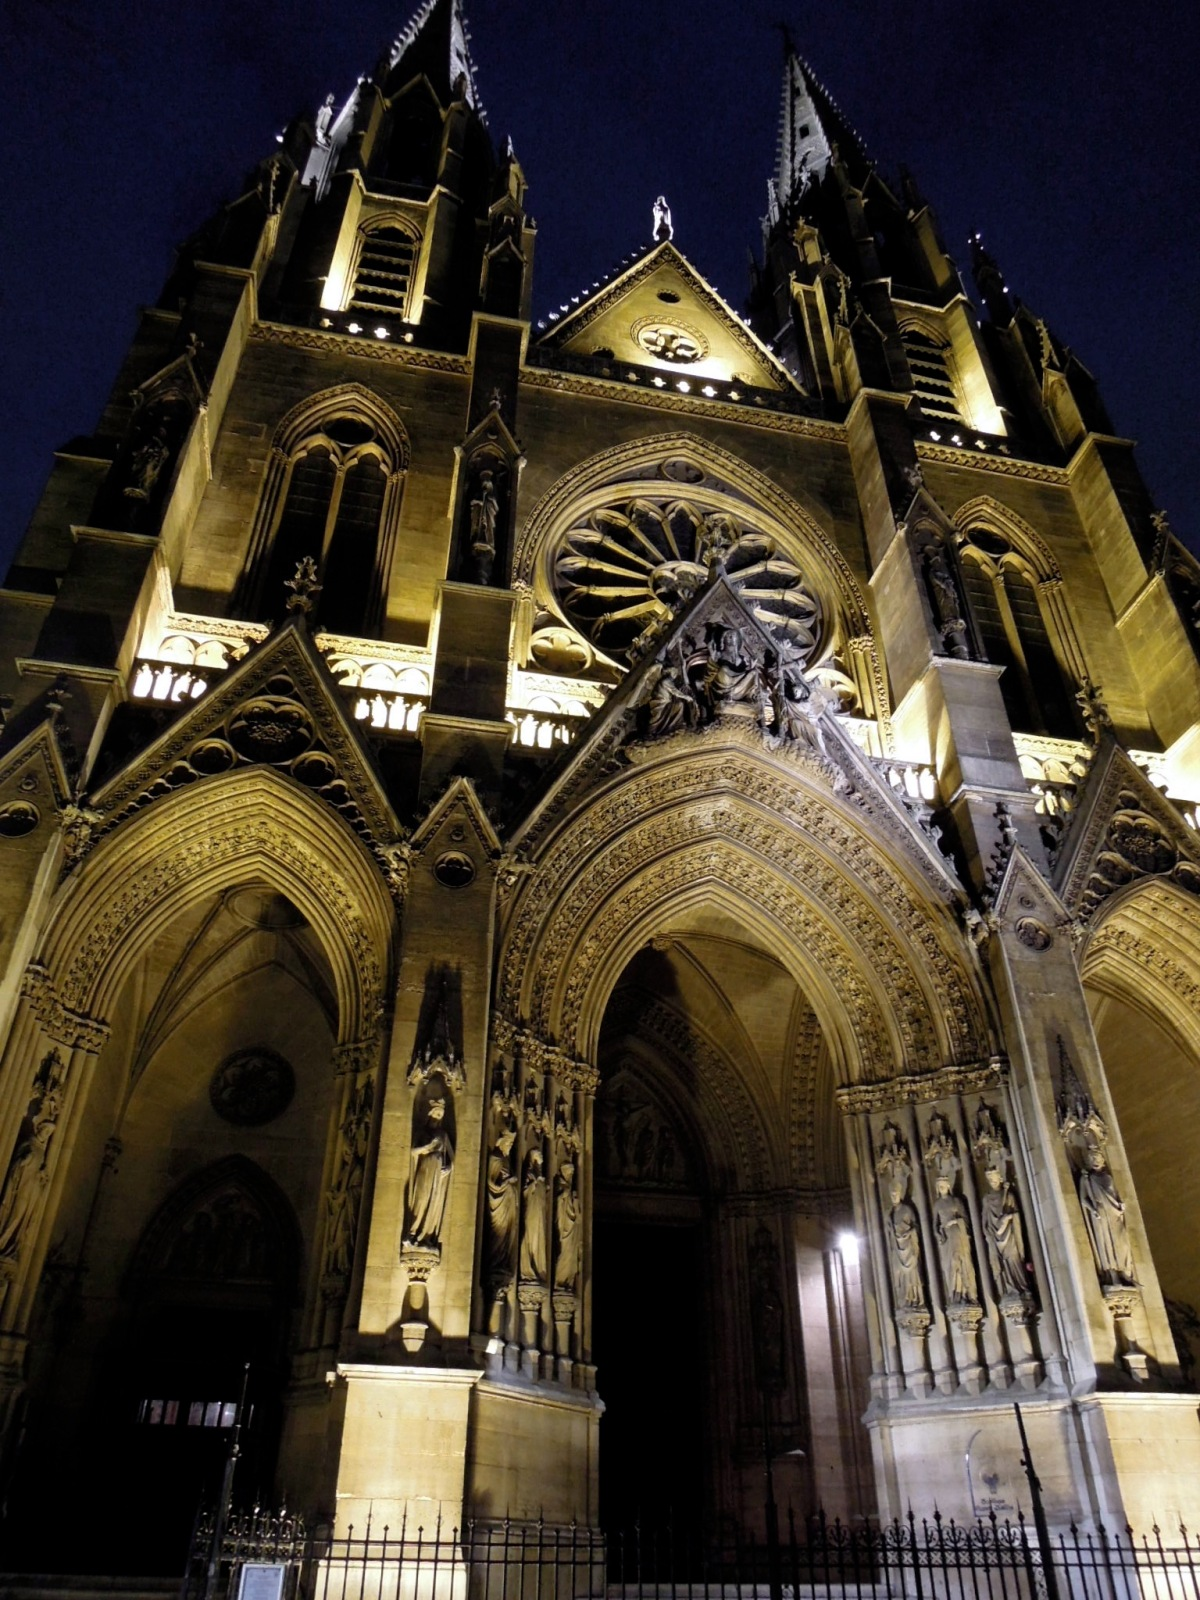 Sainte-Clotilde Basilica at night